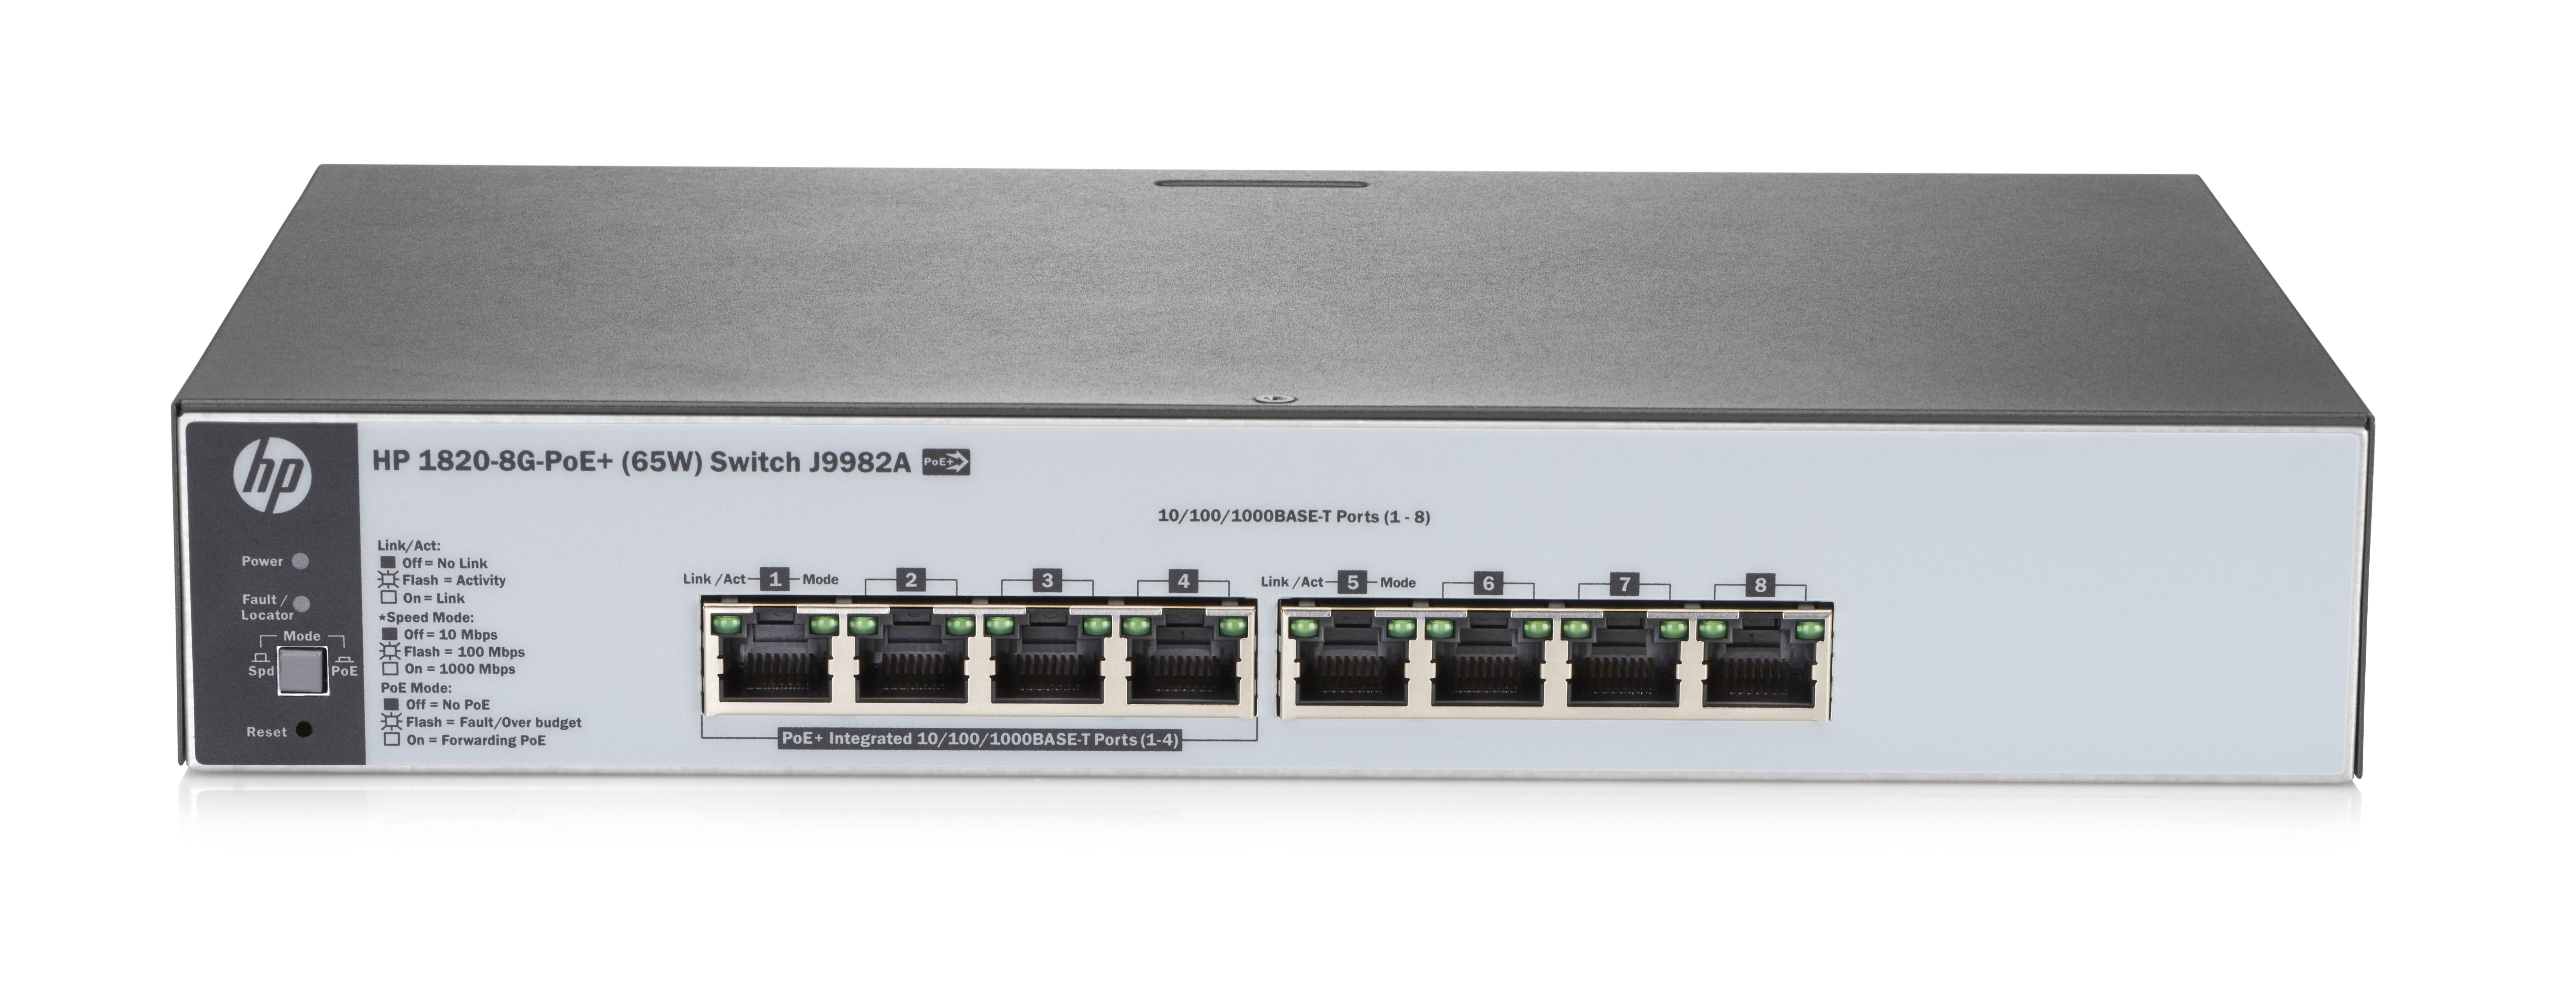 HP Enterprise 1820-8G-PoE+ (65W) - Managed - L2 - Gigabit Ethernet (10/100/1000) - Power over Ethernet (PoE) - Rack-Einbau - 1U